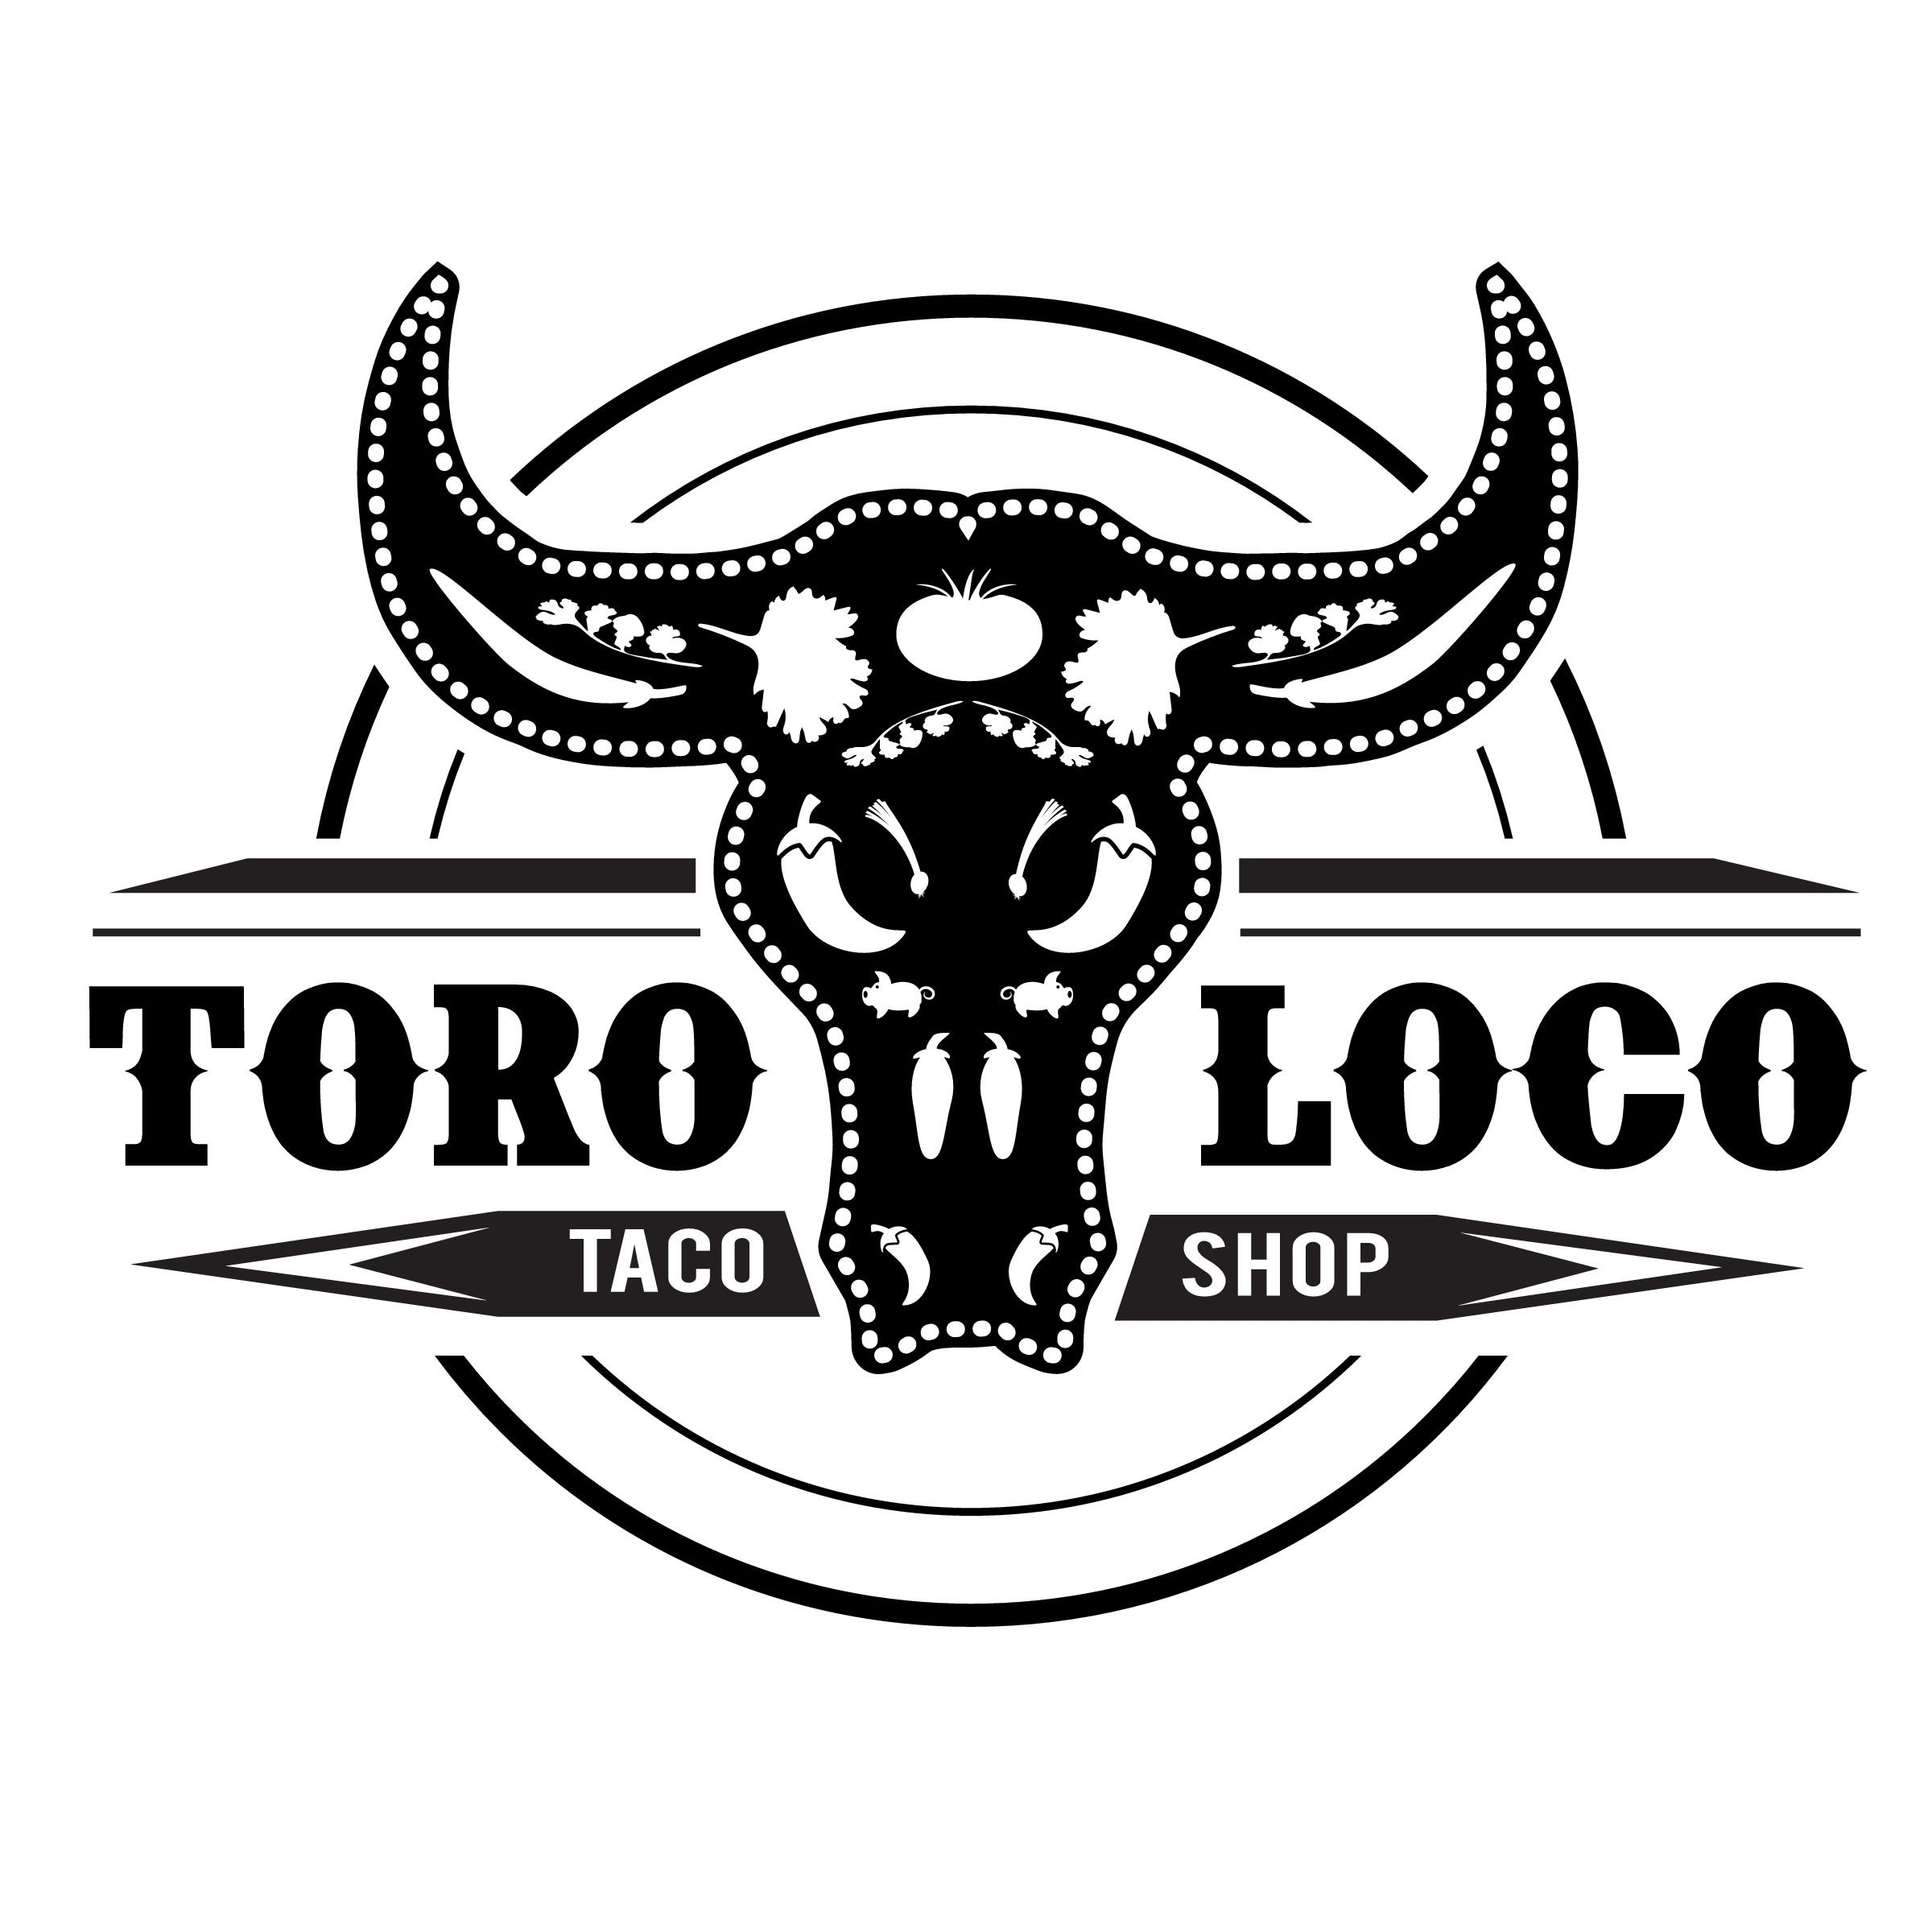 Love Tacos? So do we! Help please!